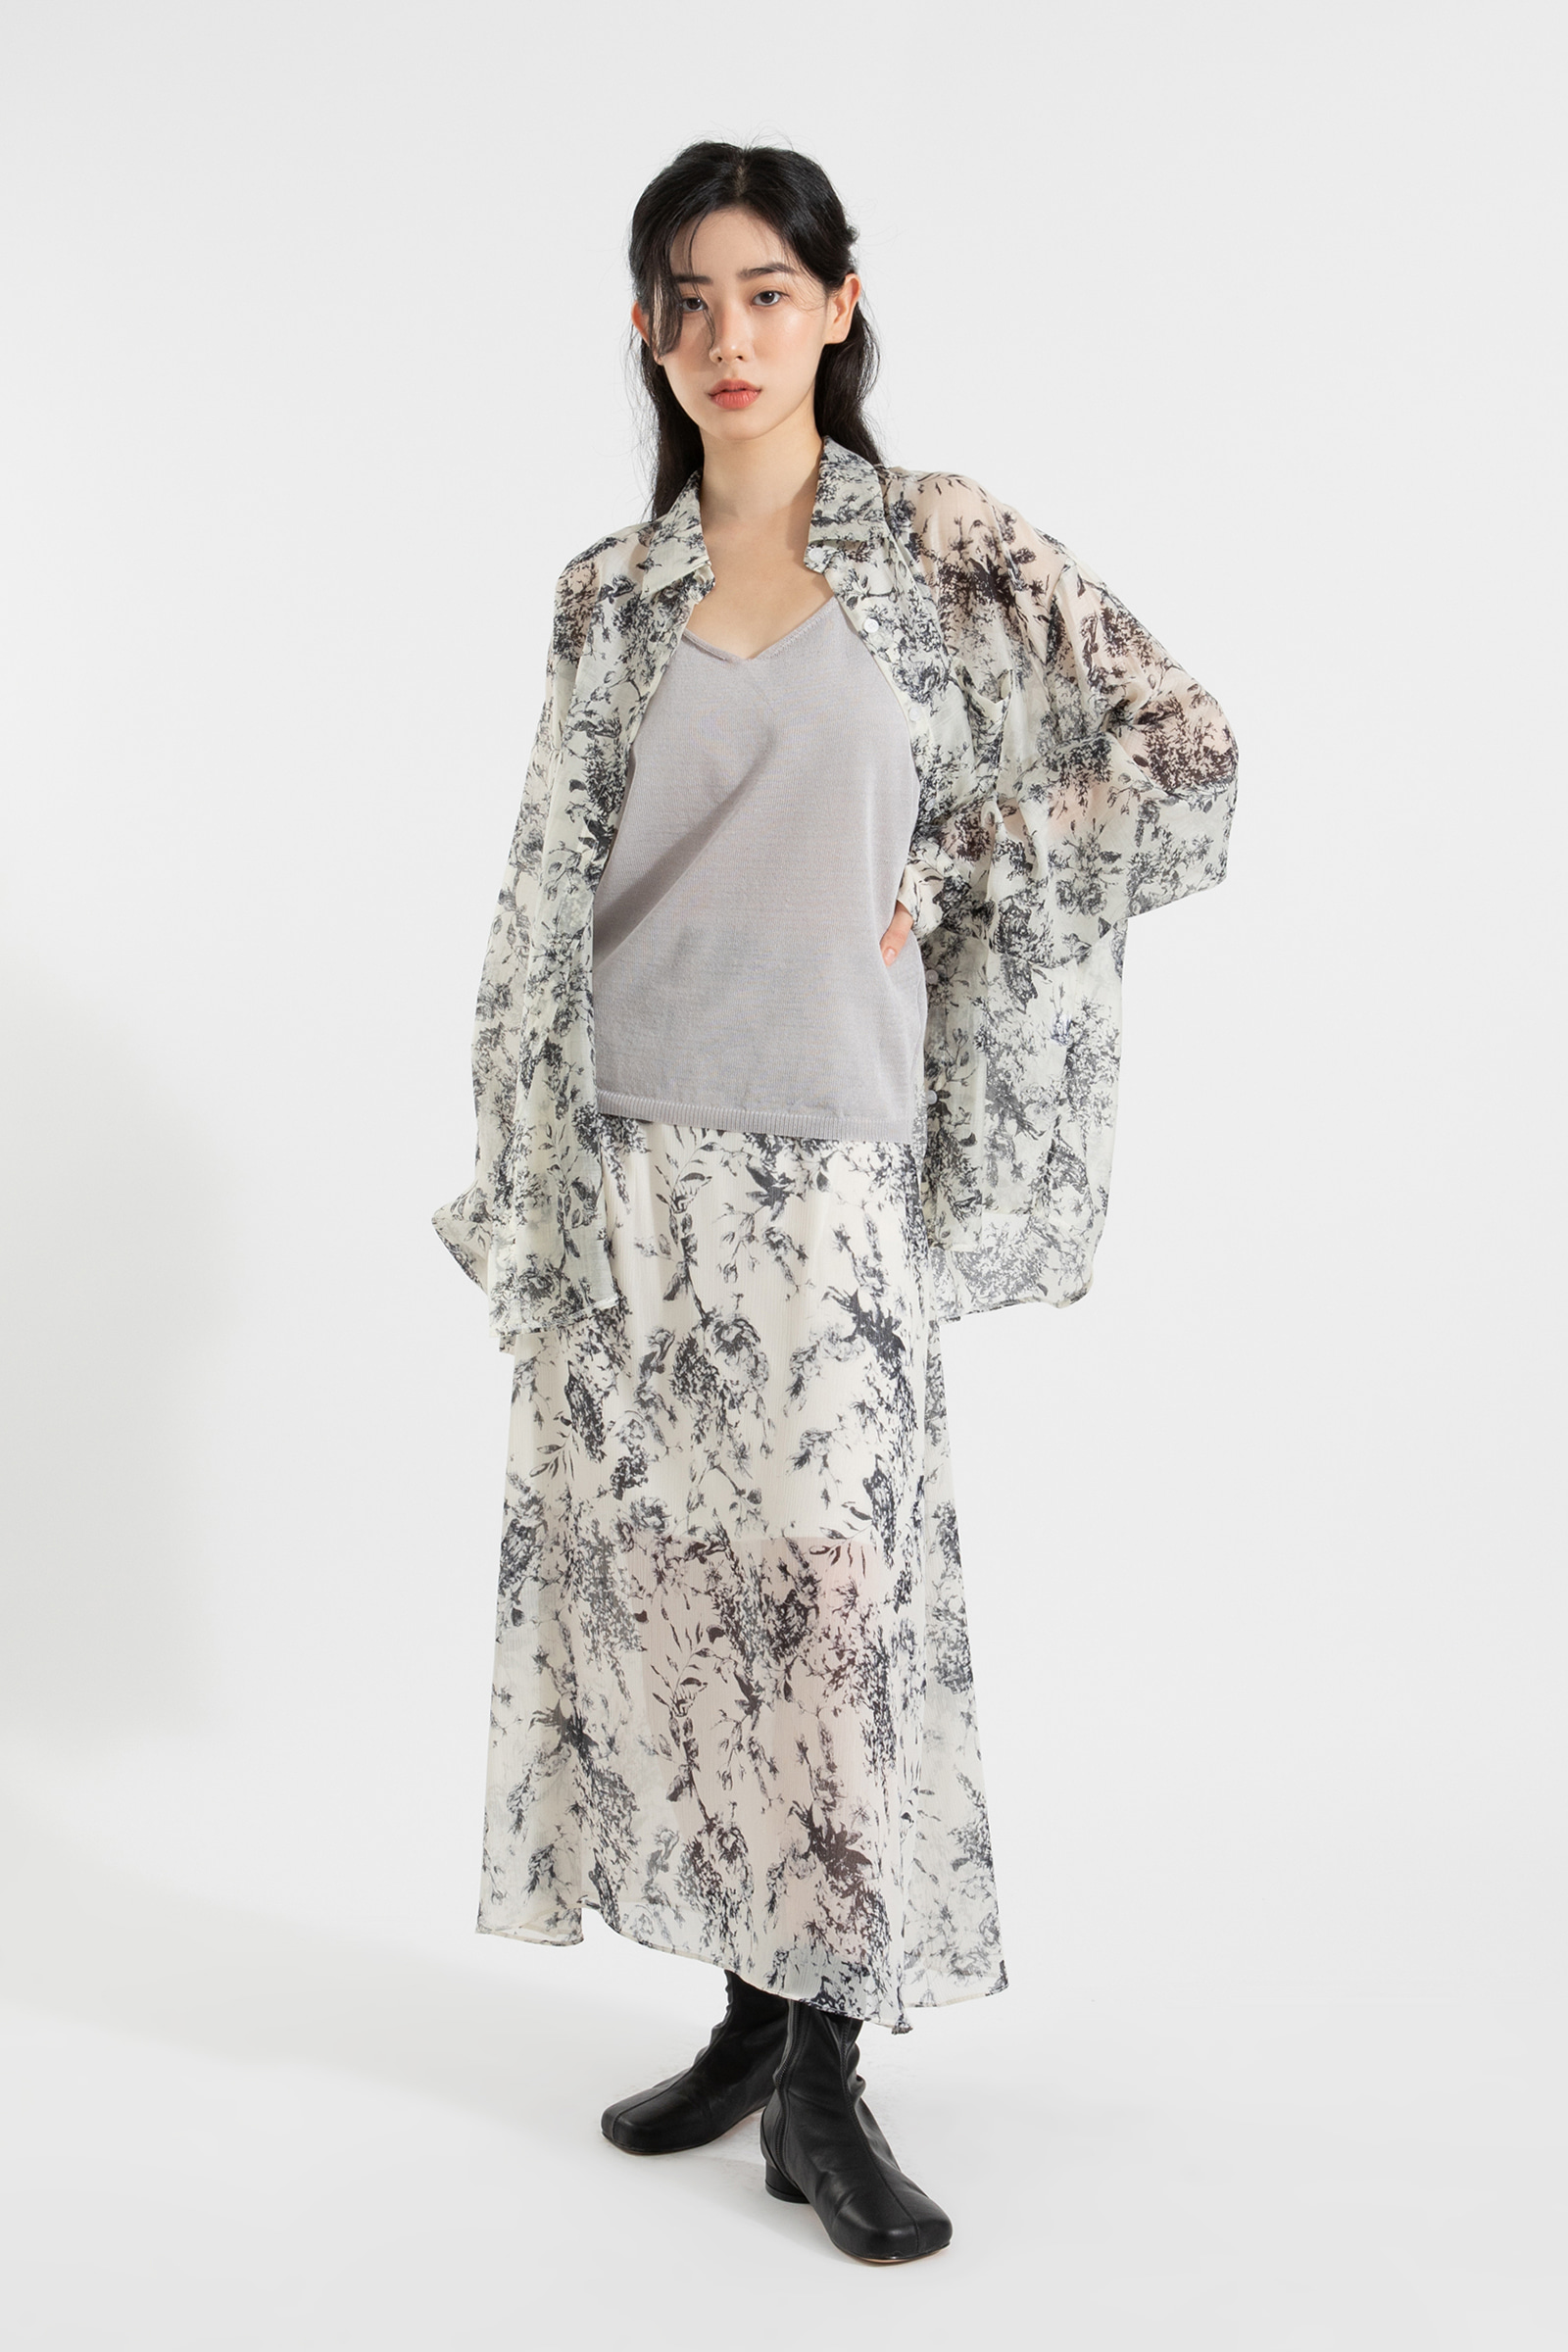 Linen twist sleeveless knit